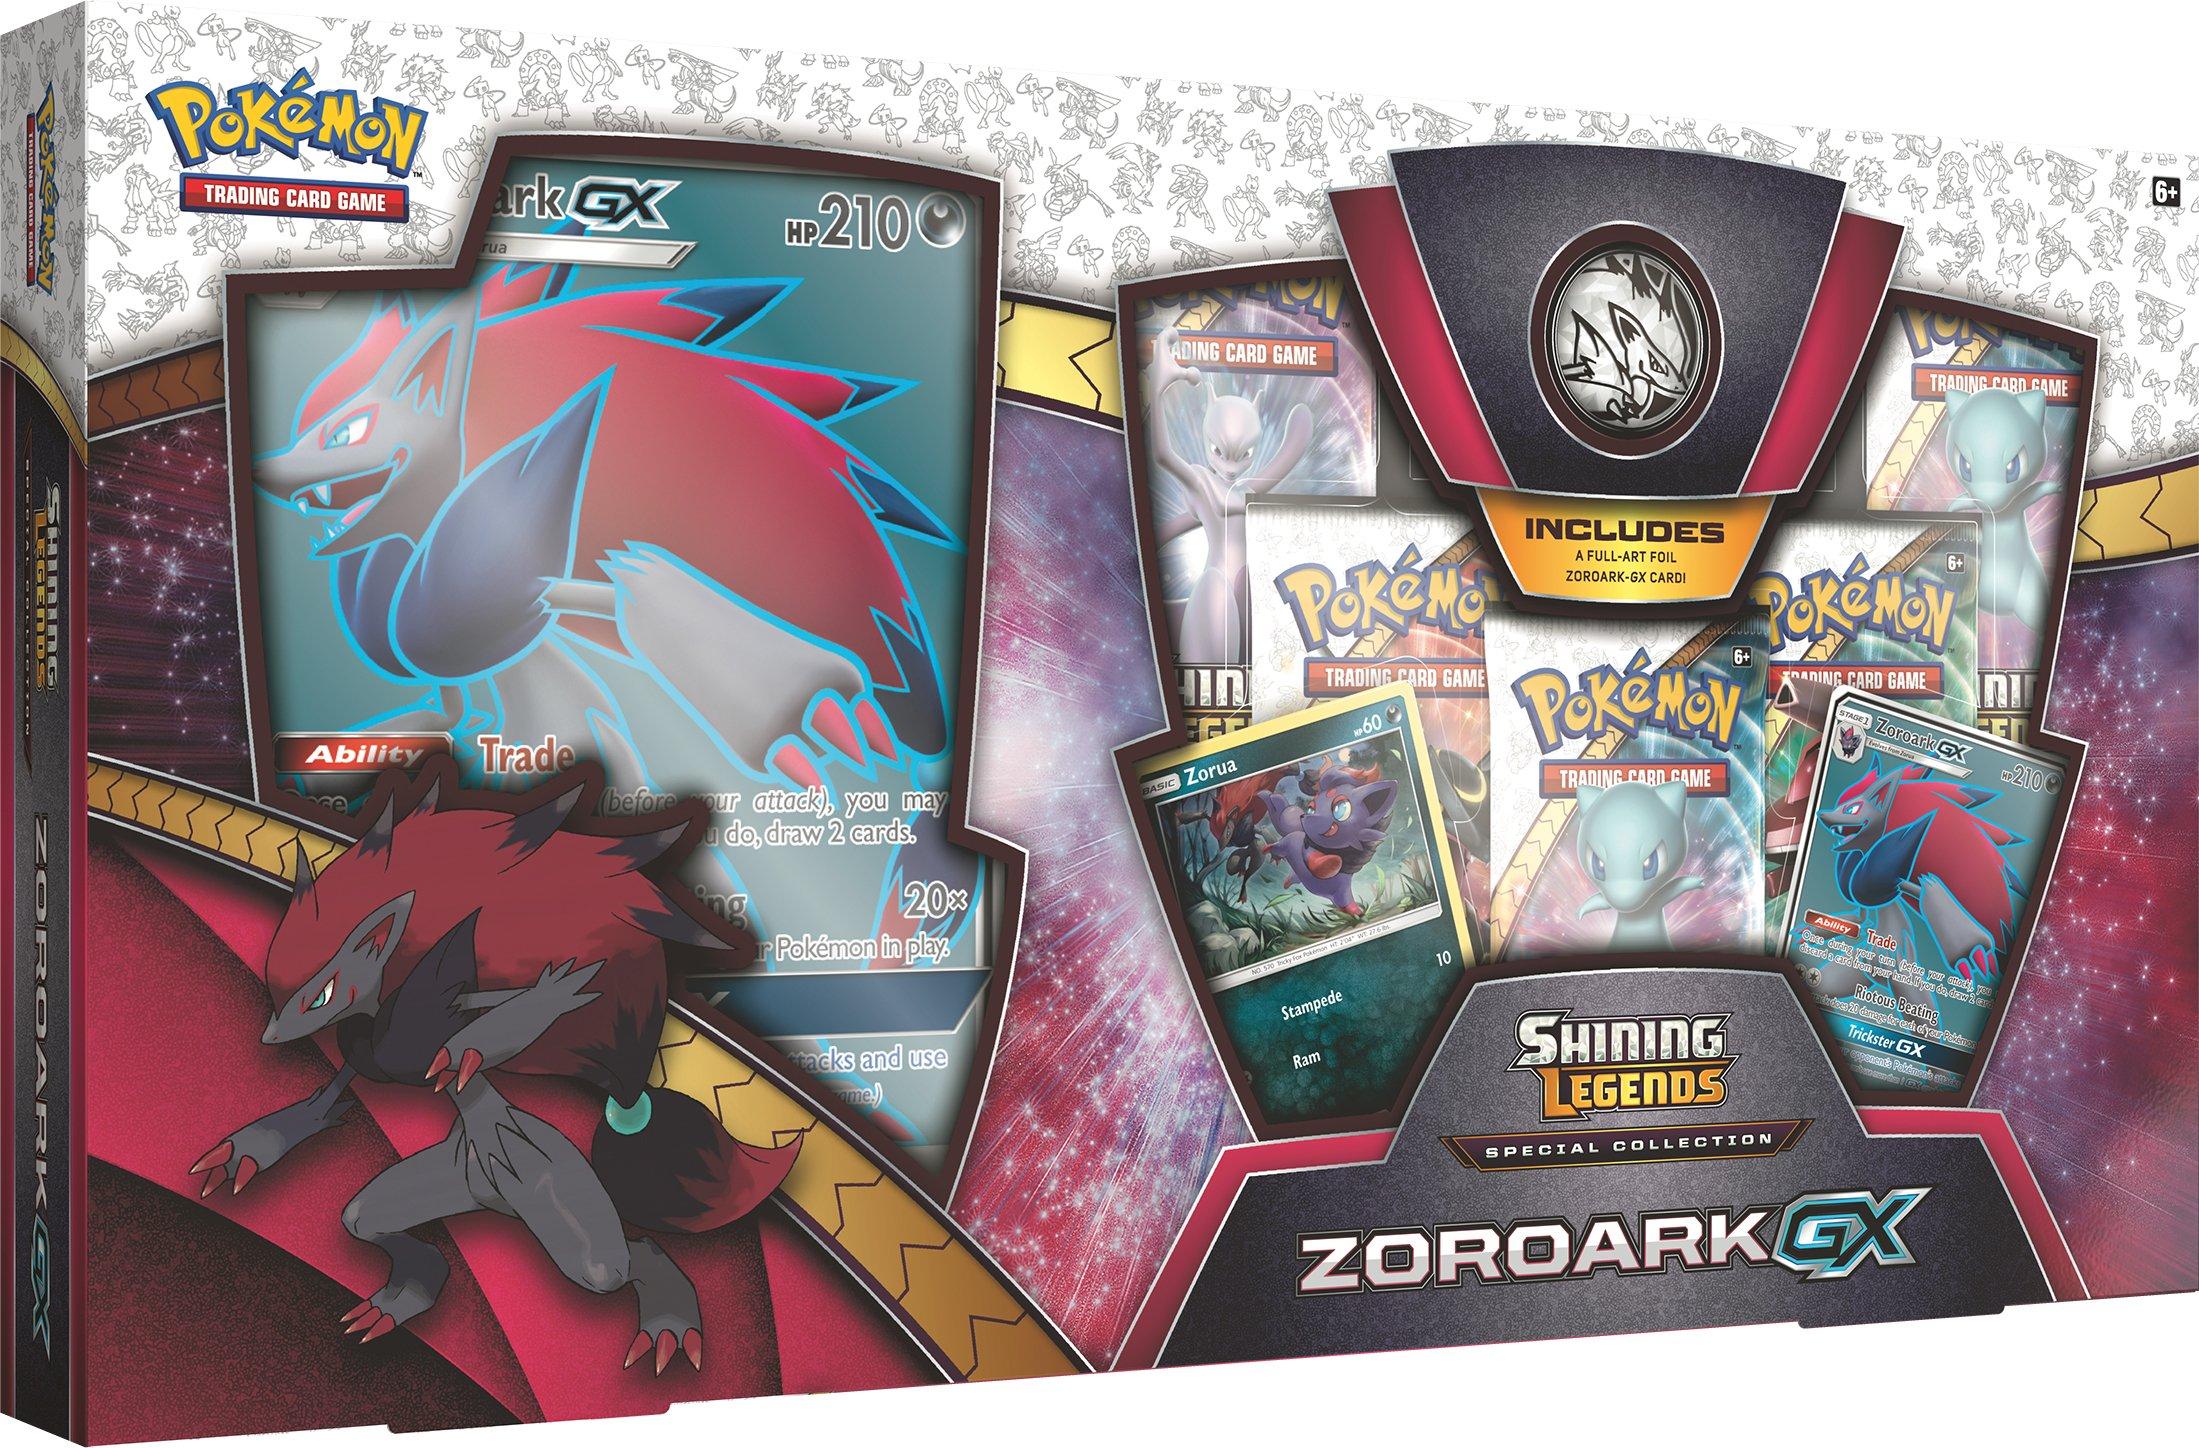 Pokemon Cards 80339 SM3.5 Shining Legends Zoroark GX Sp Col, Box